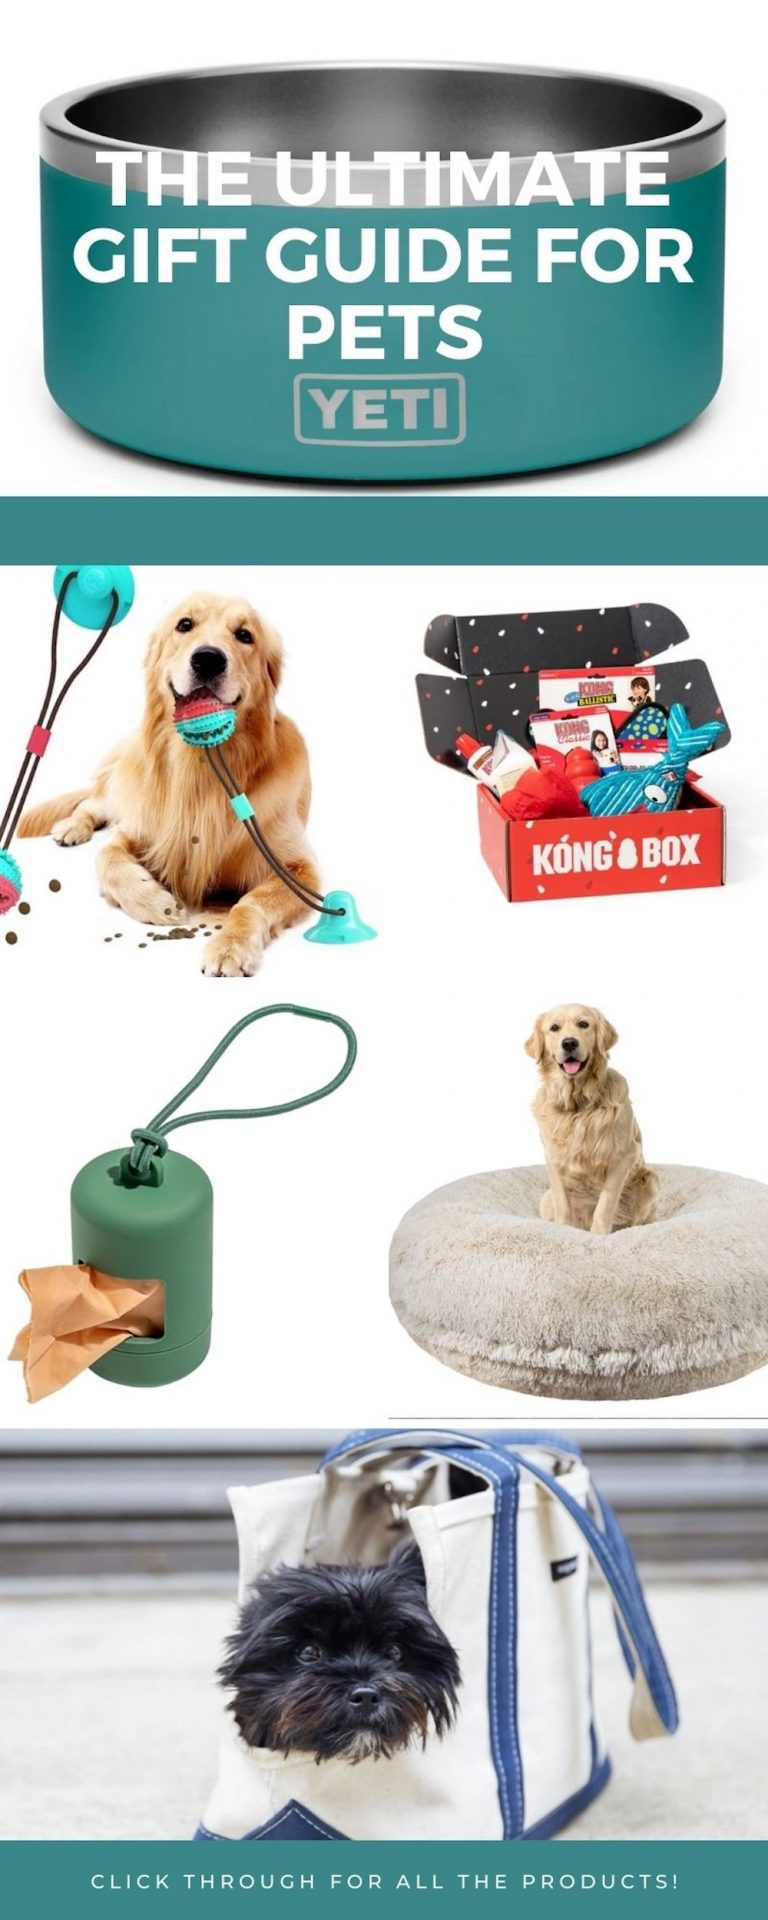 Pinterest - Pet Gift Guide Roundup